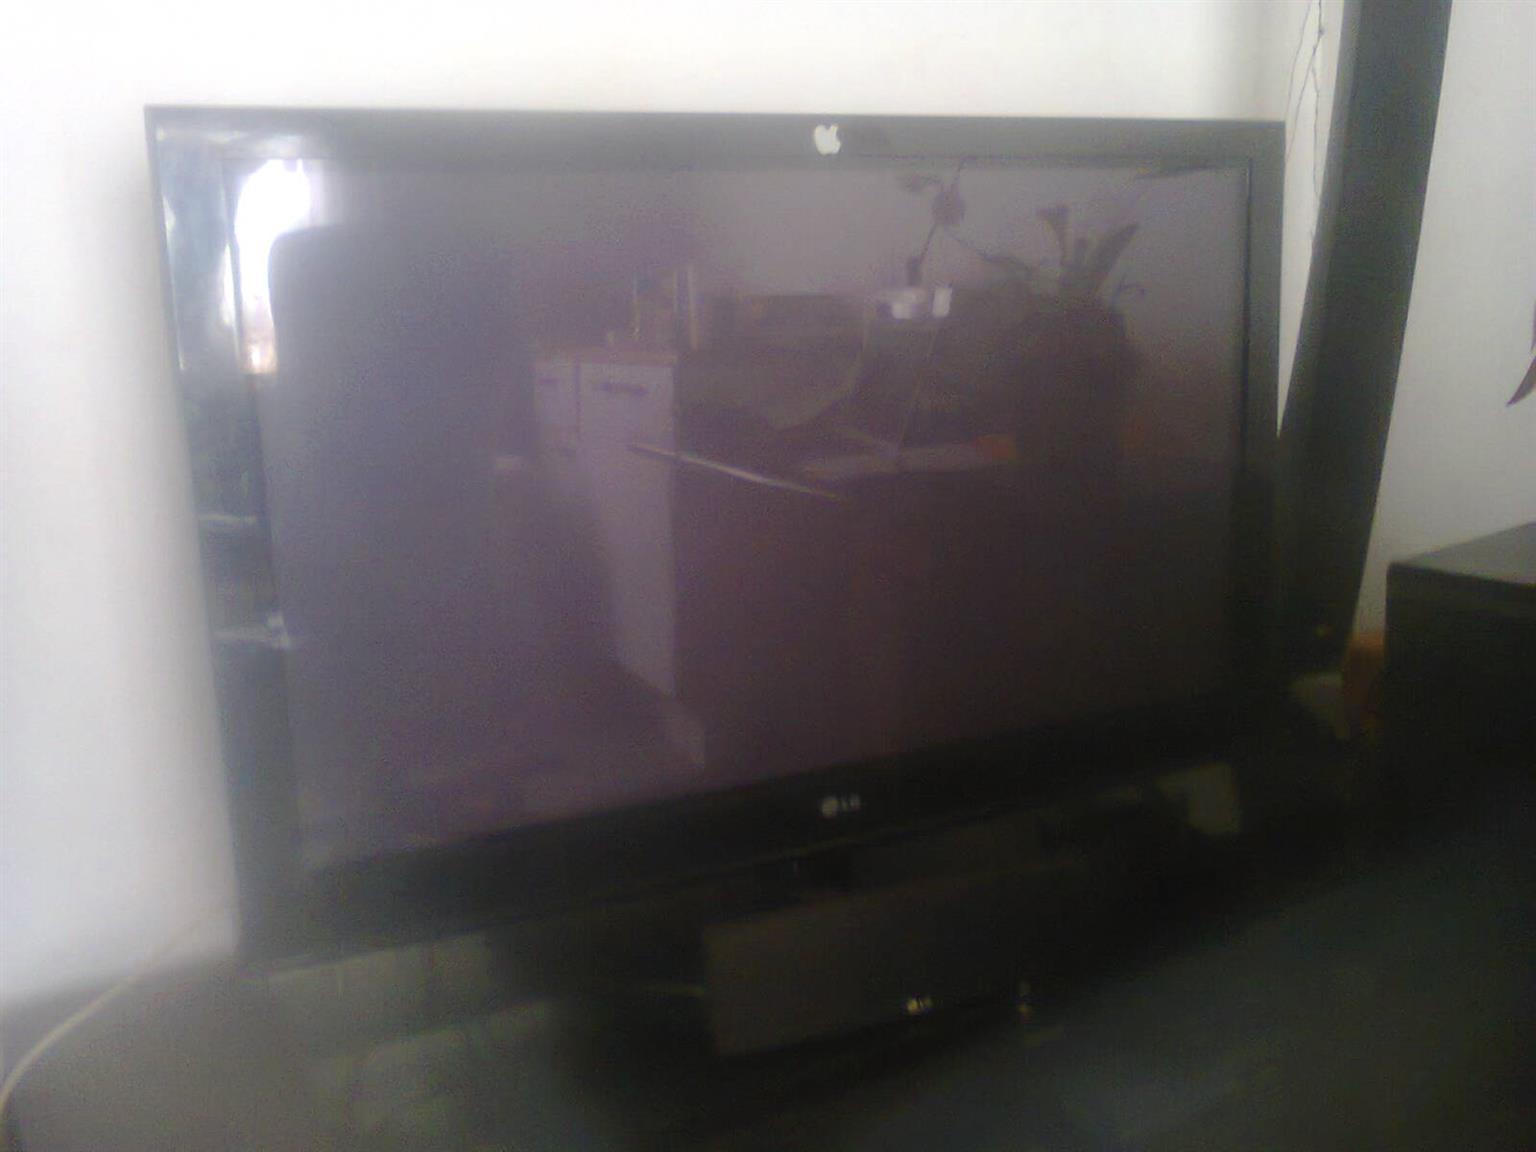 LG PLASMA TV, 106cm